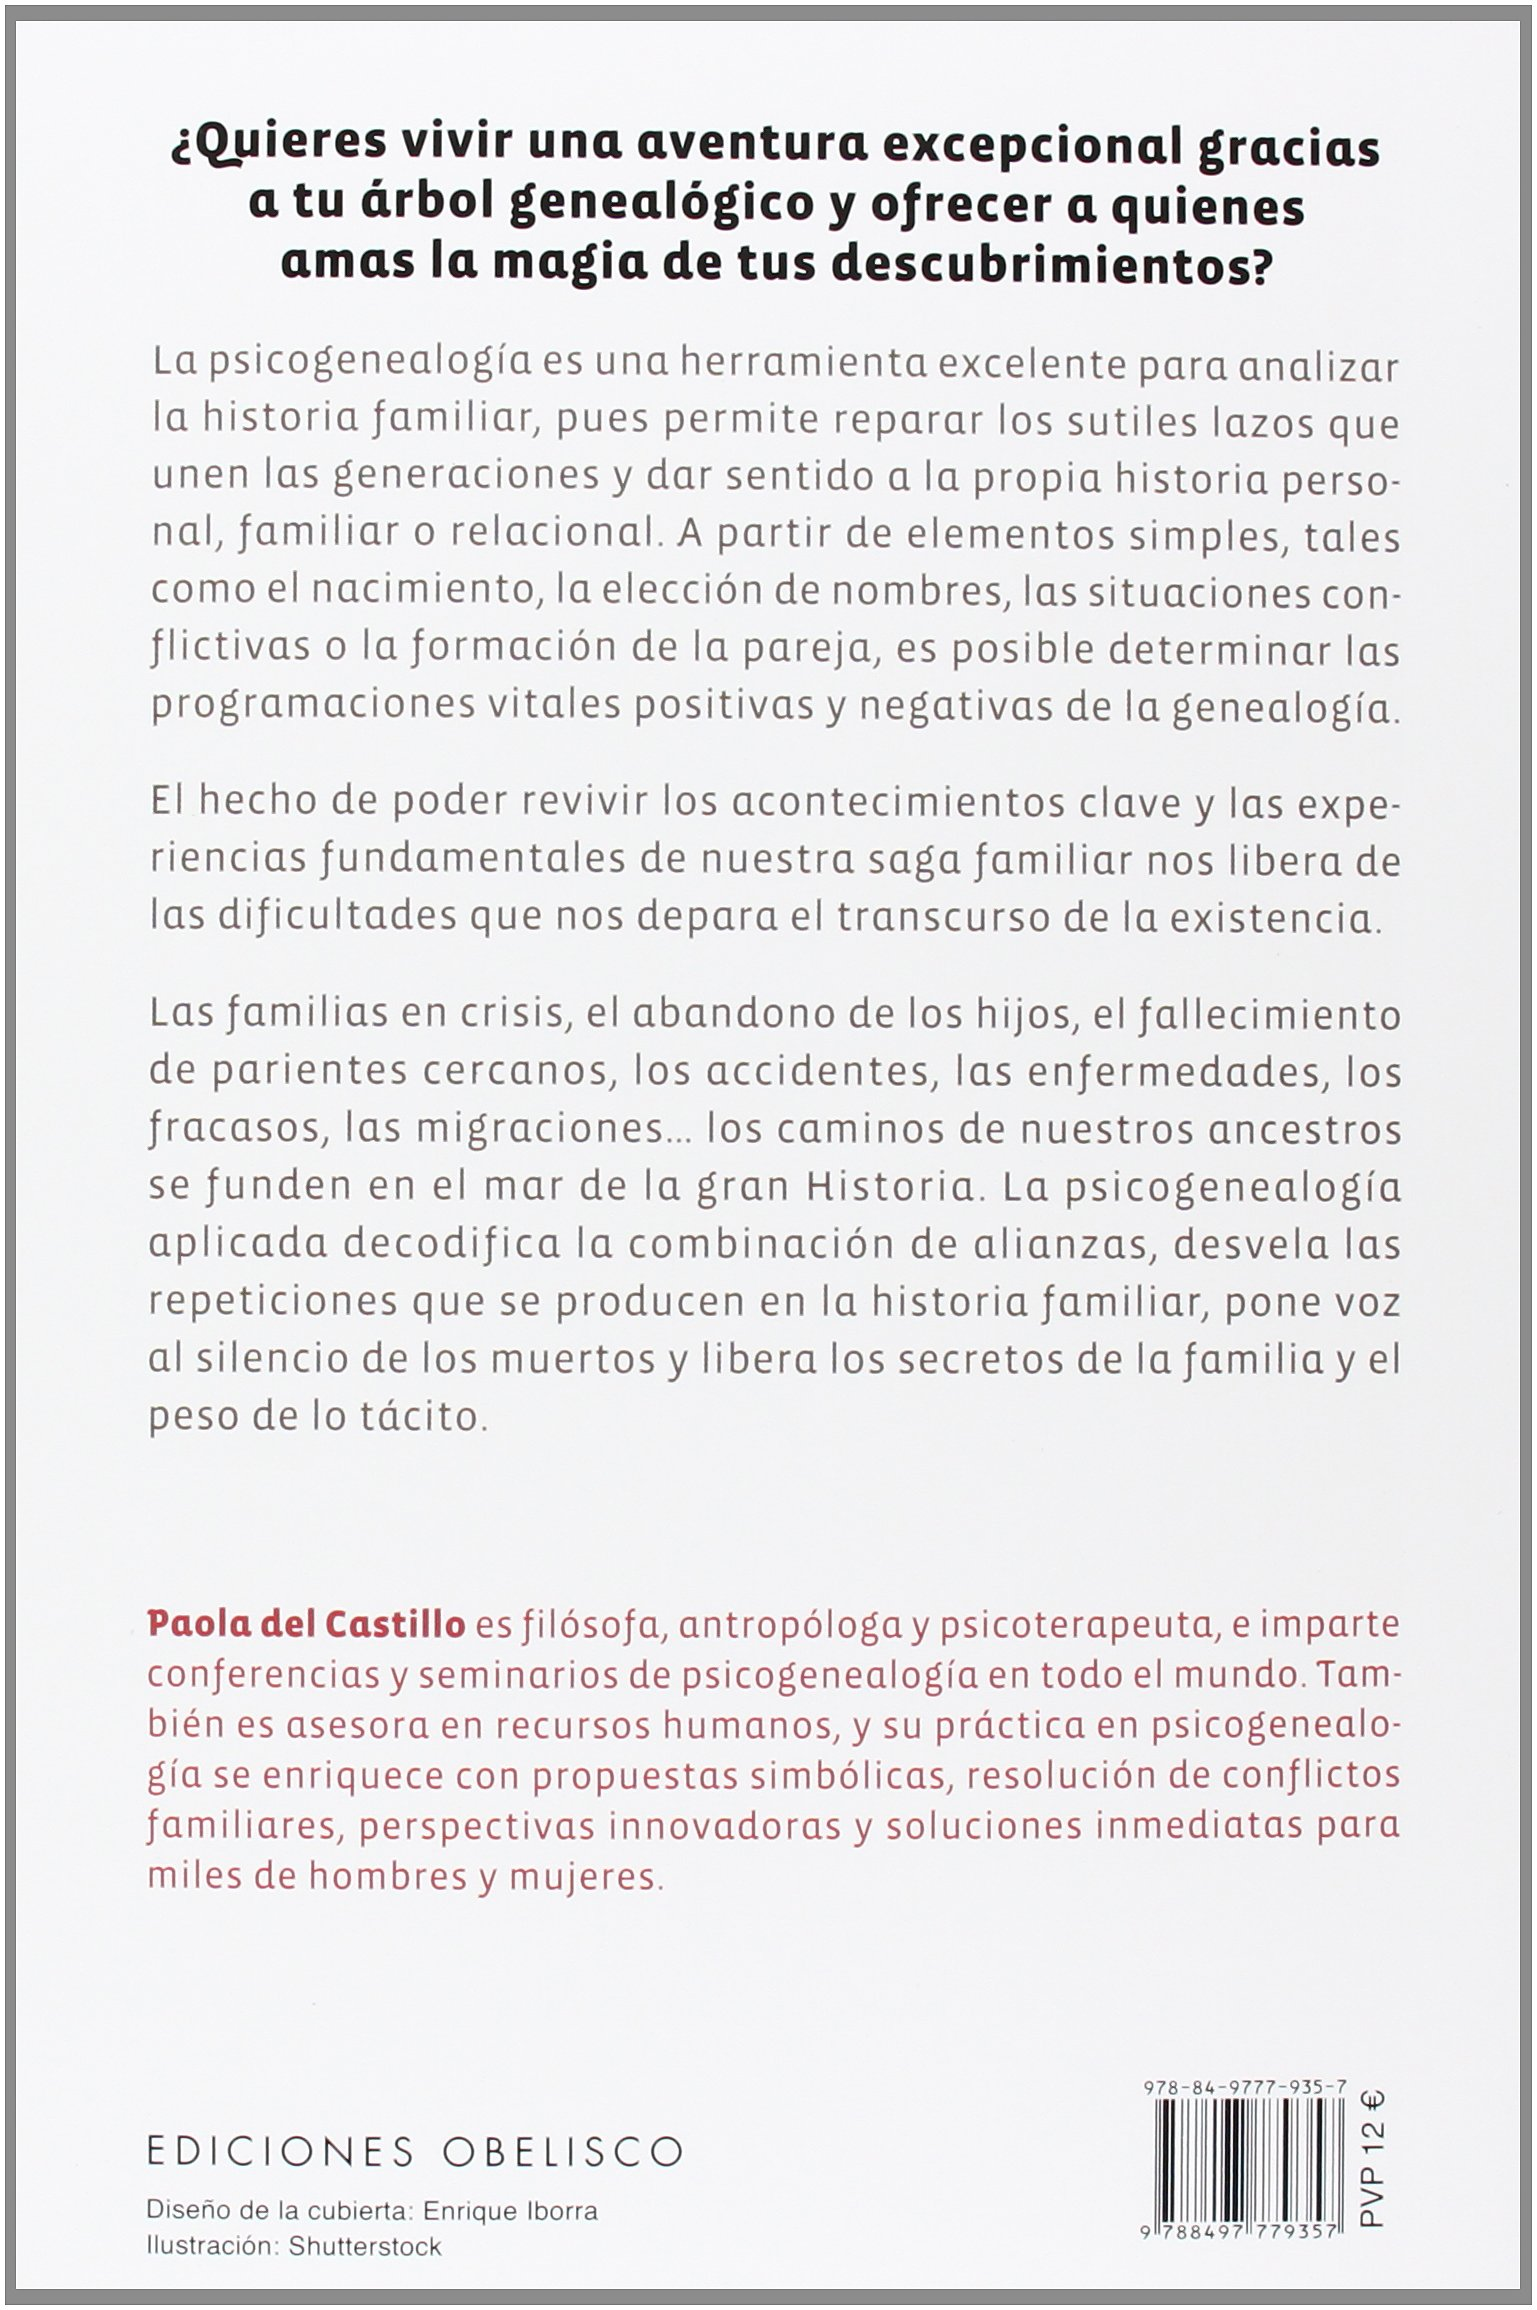 La psicogenealogia aplicada spanish edition paola del castillo la psicogenealogia aplicada spanish edition paola del castillo 9788497779357 amazon books fandeluxe Choice Image